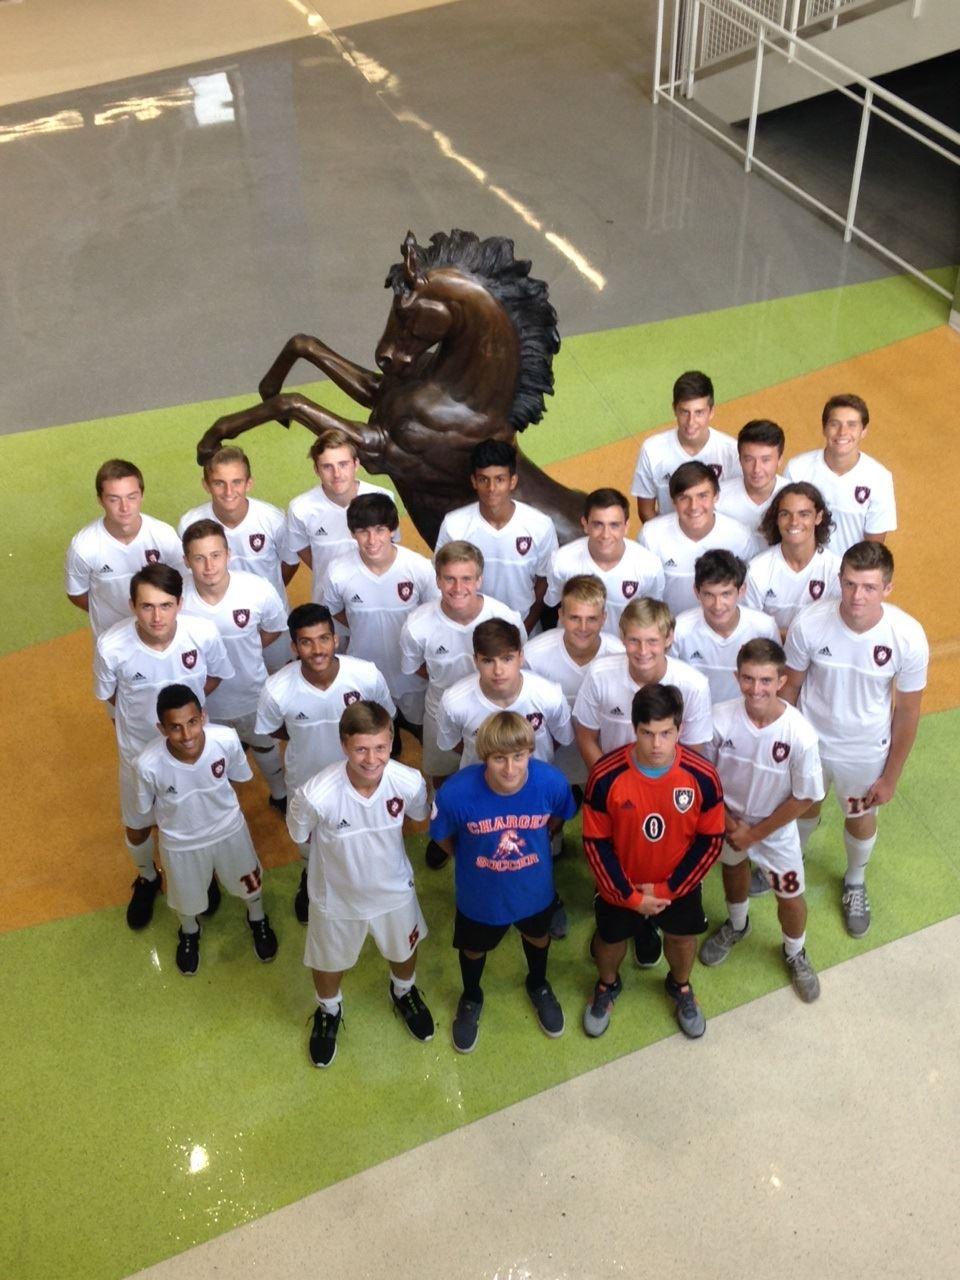 Stagg High School - Boys' Varsity Soccer